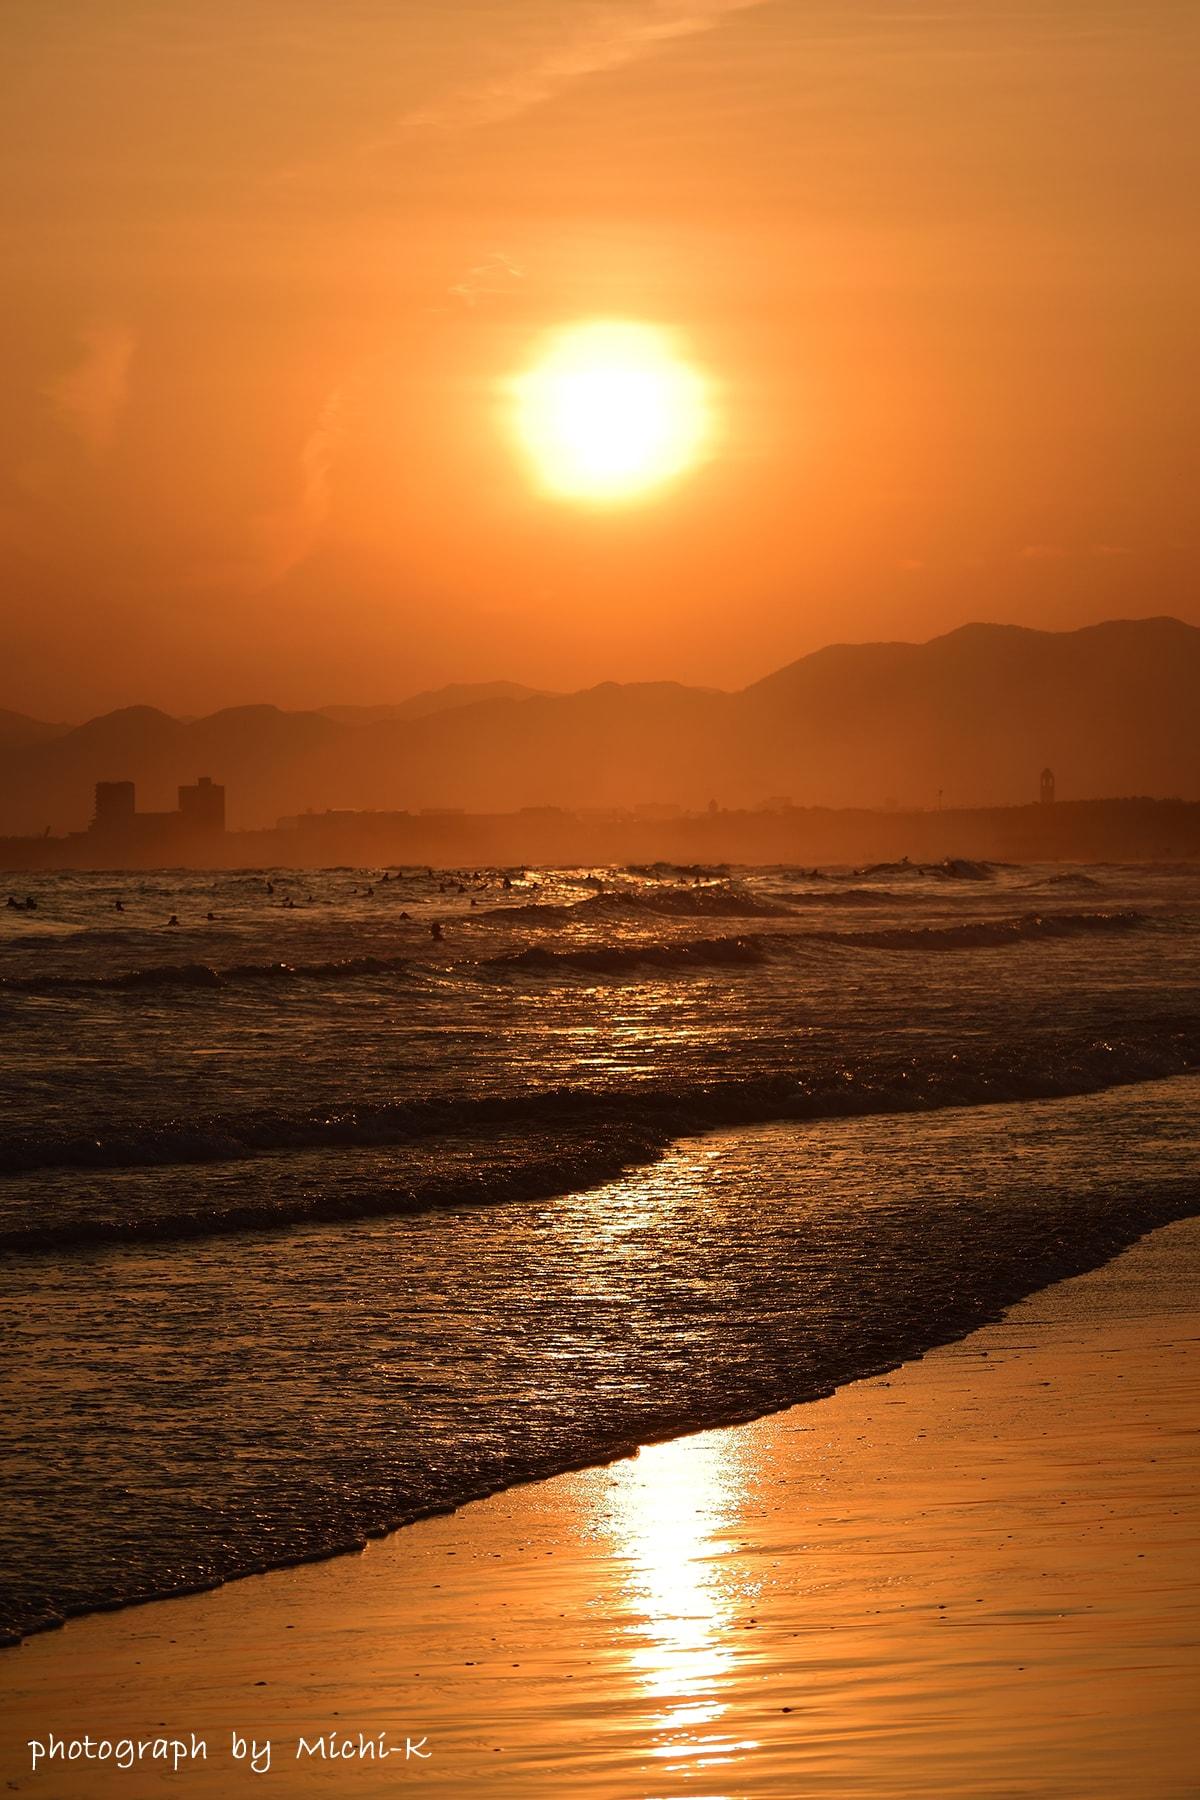 江ノ島・西浜海水浴場-3、沈む夕日